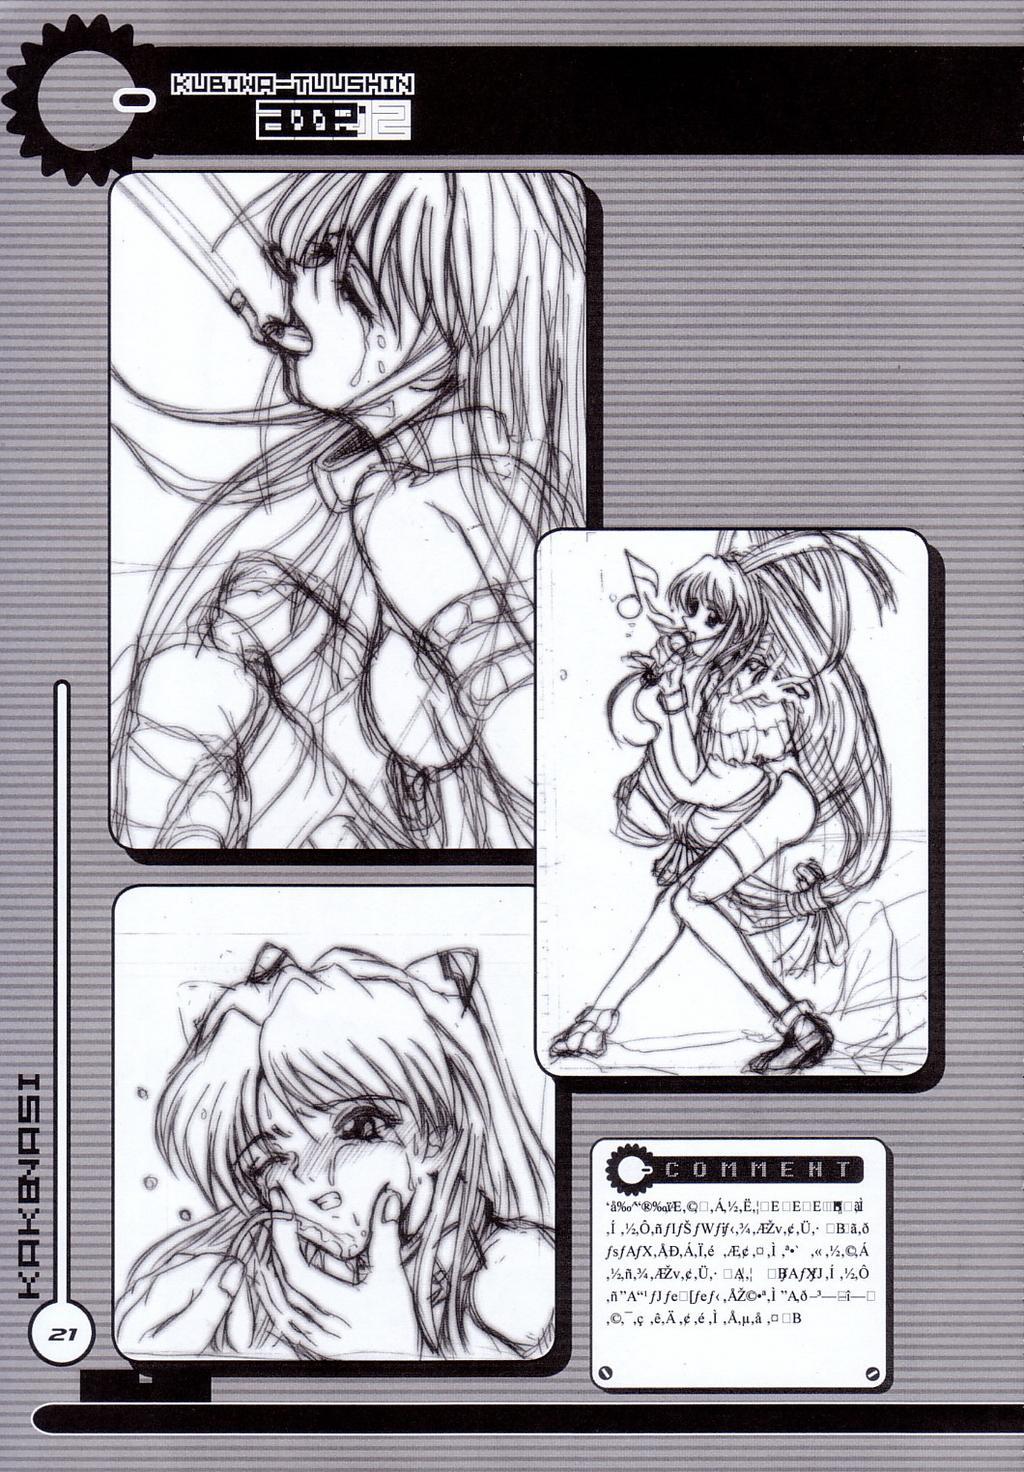 Kubiwa Tsuushin Volume 4 19